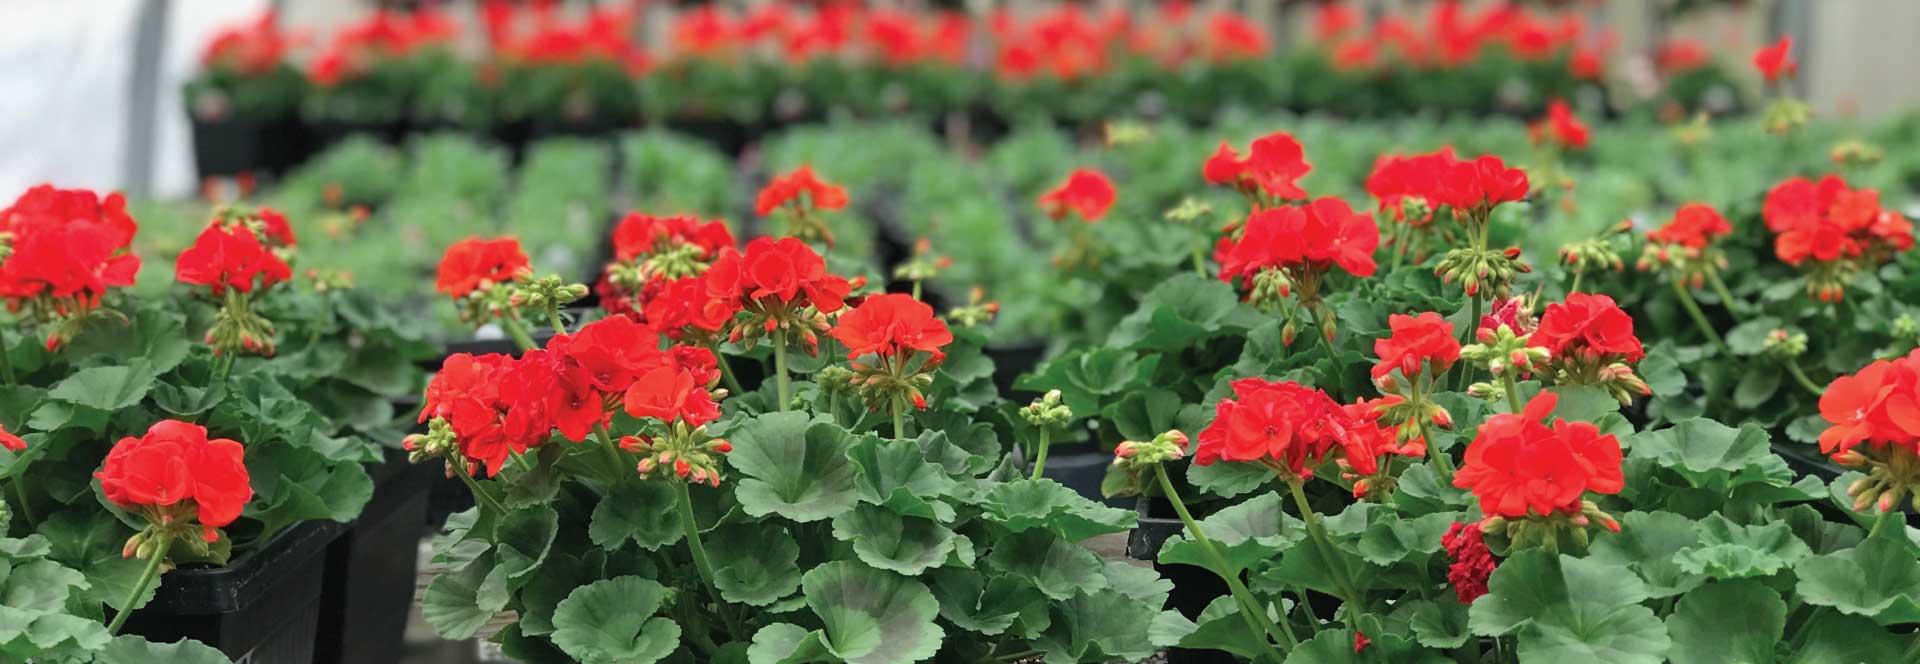 red-flowers-image-sandys-back-porch